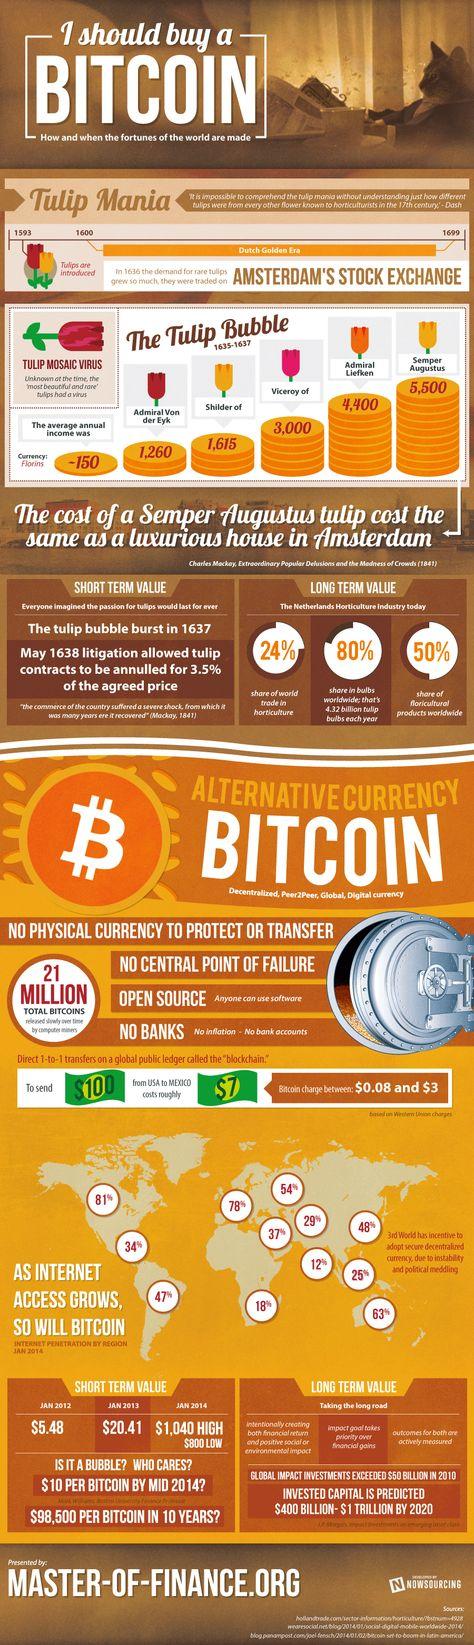 Câștigați Bitcoins Automat - Metode de plată online cazinou online